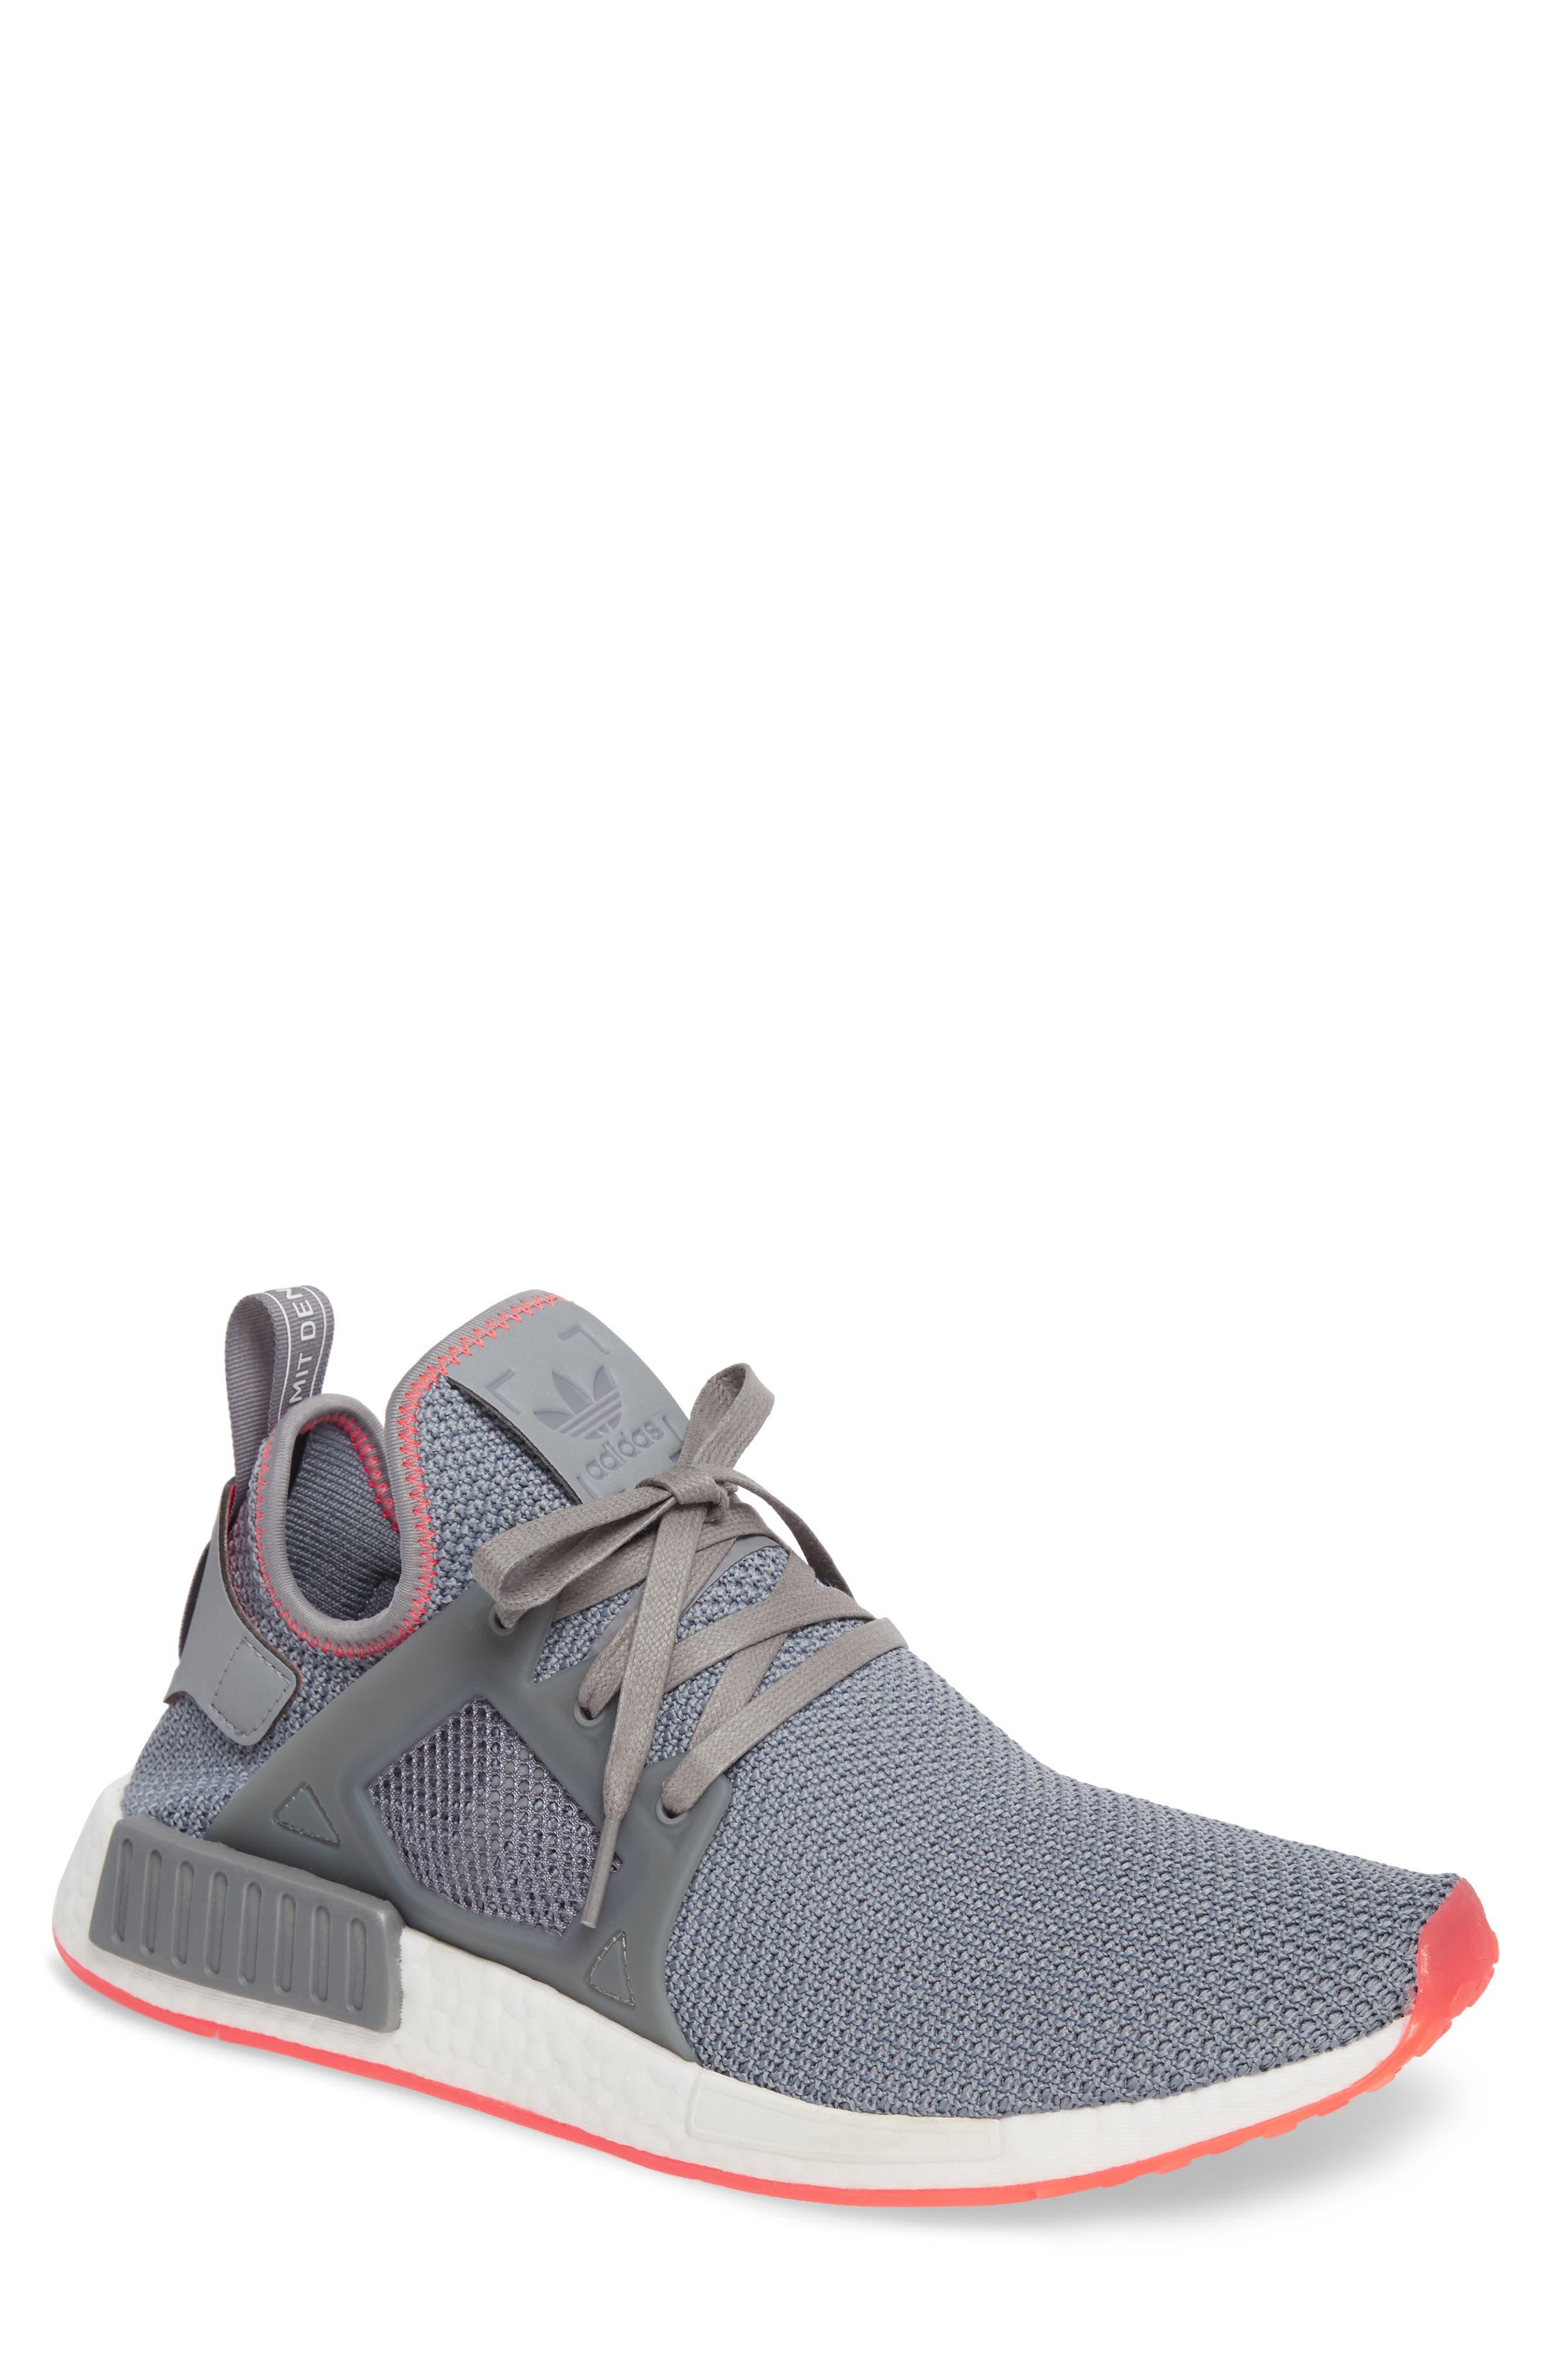 adidas NMD_XR1 Sneaker (Men)